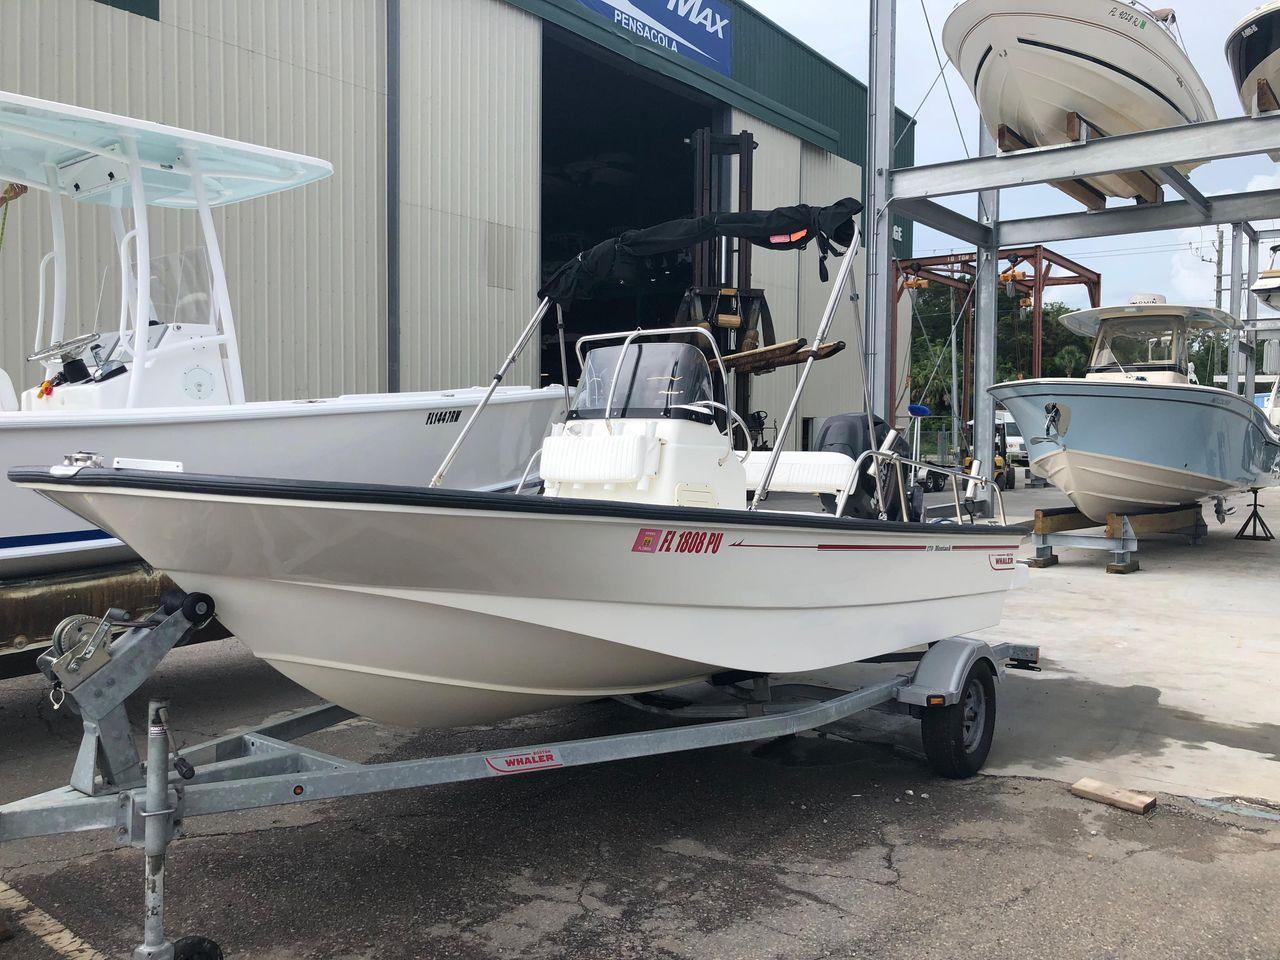 2014 Used Boston Whaler 17 Montauk Sports Fishing Boat For